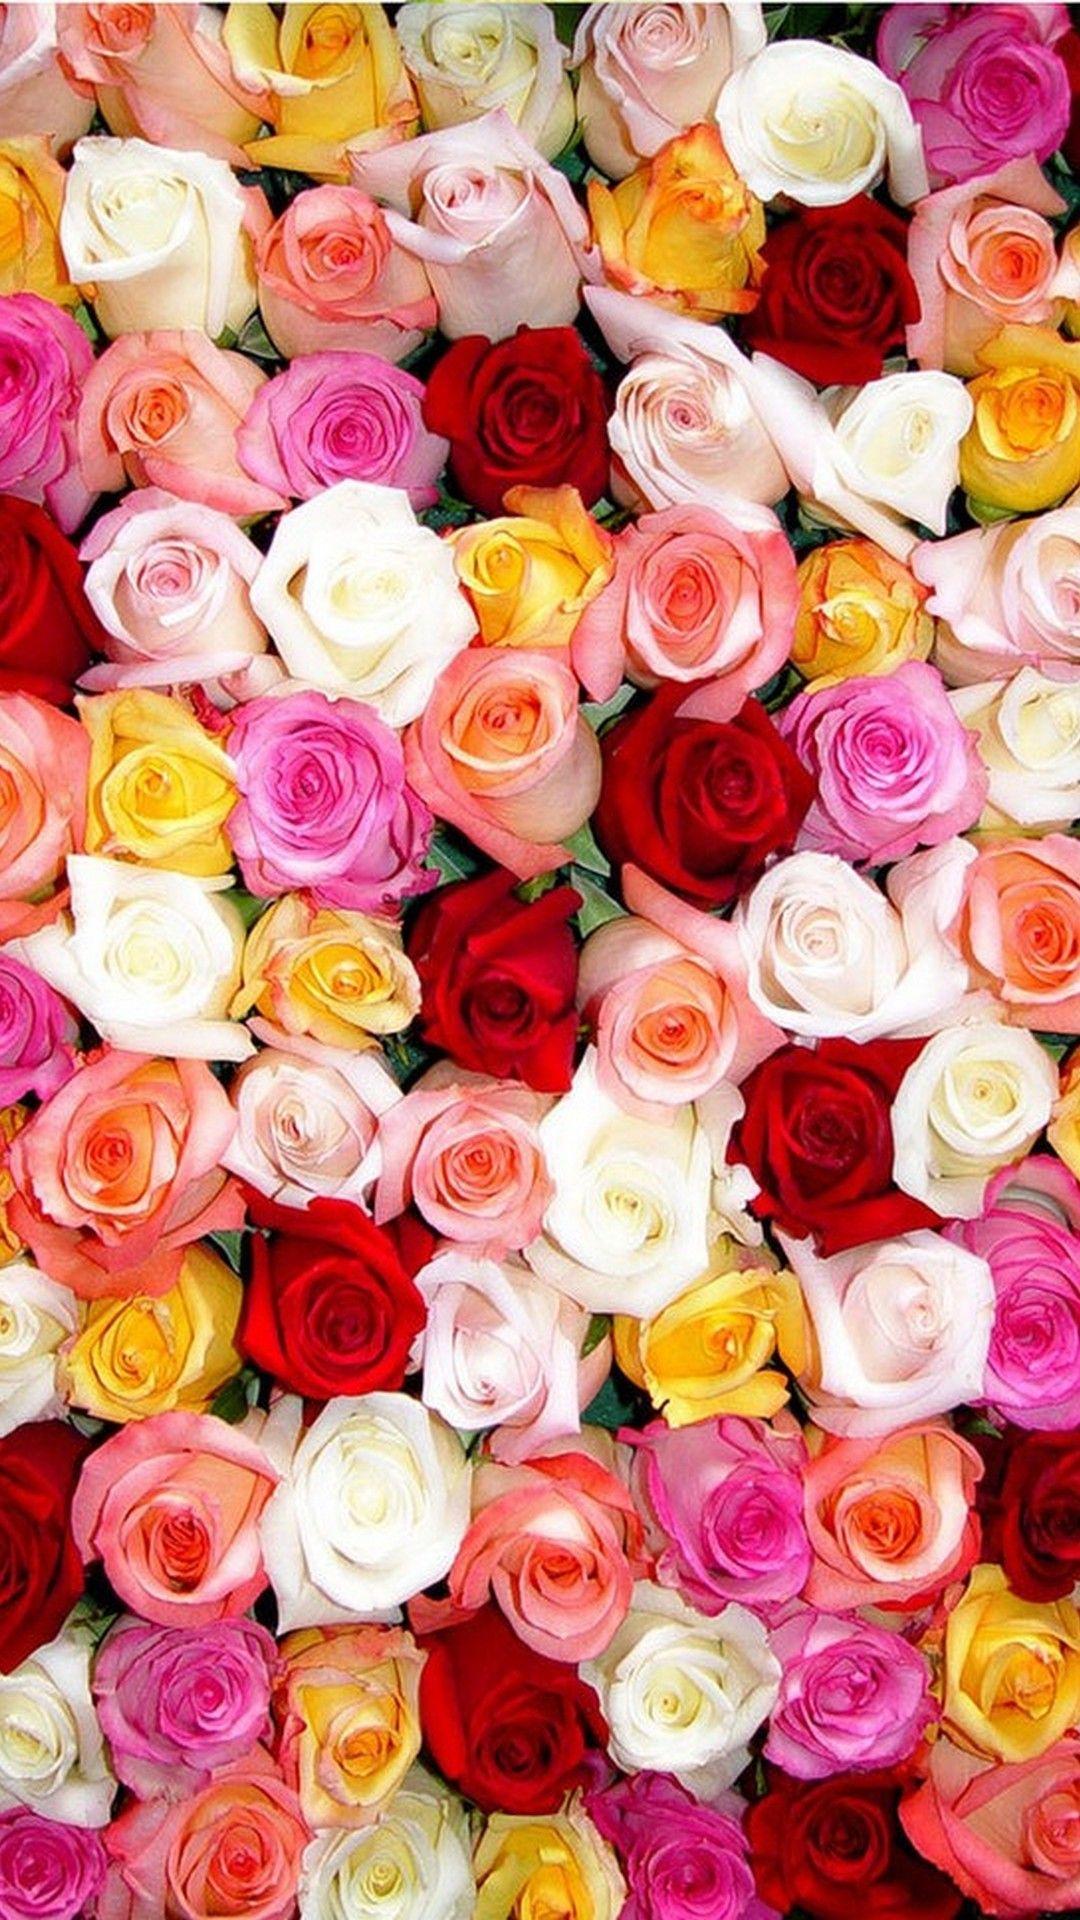 Rose HD Wallpaper iPhone Best HD Wallpapers Flower